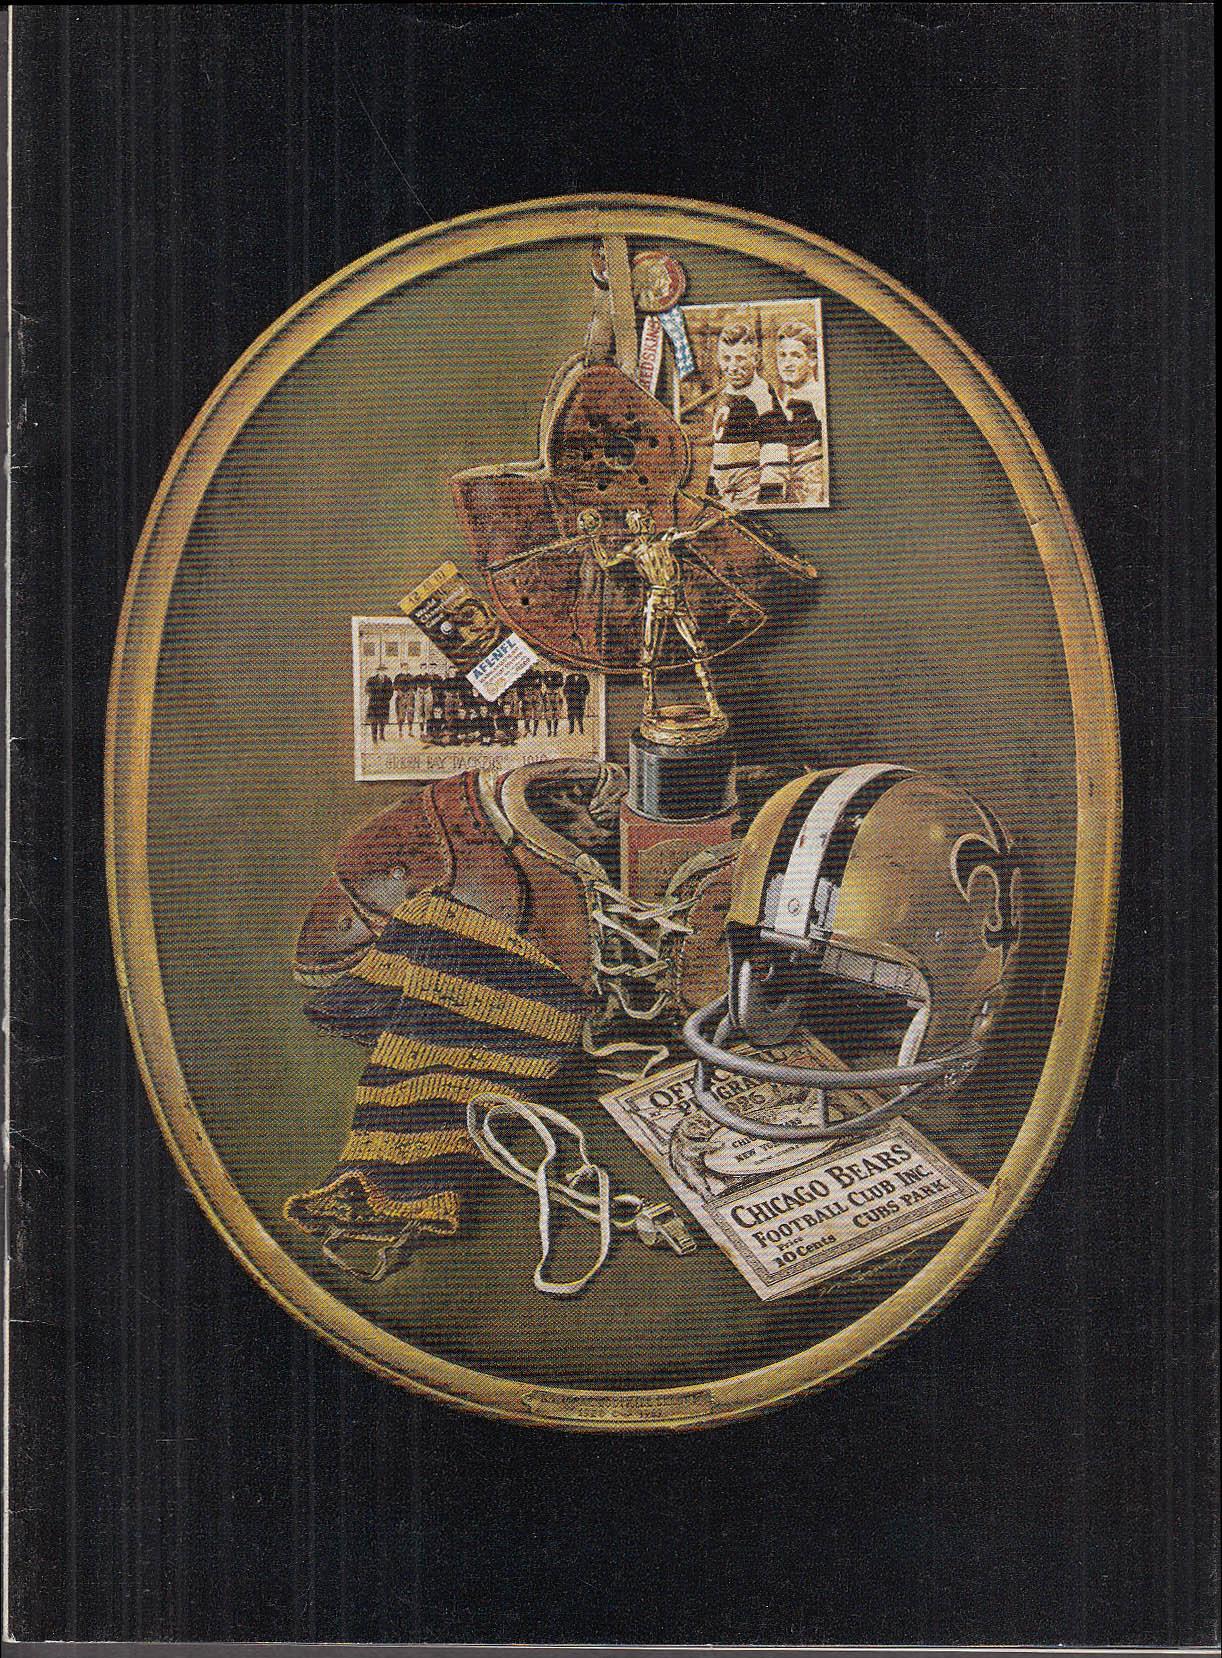 NFL 50th Season 1969 advertising insert James Dickey Jim Murray Bob Considine